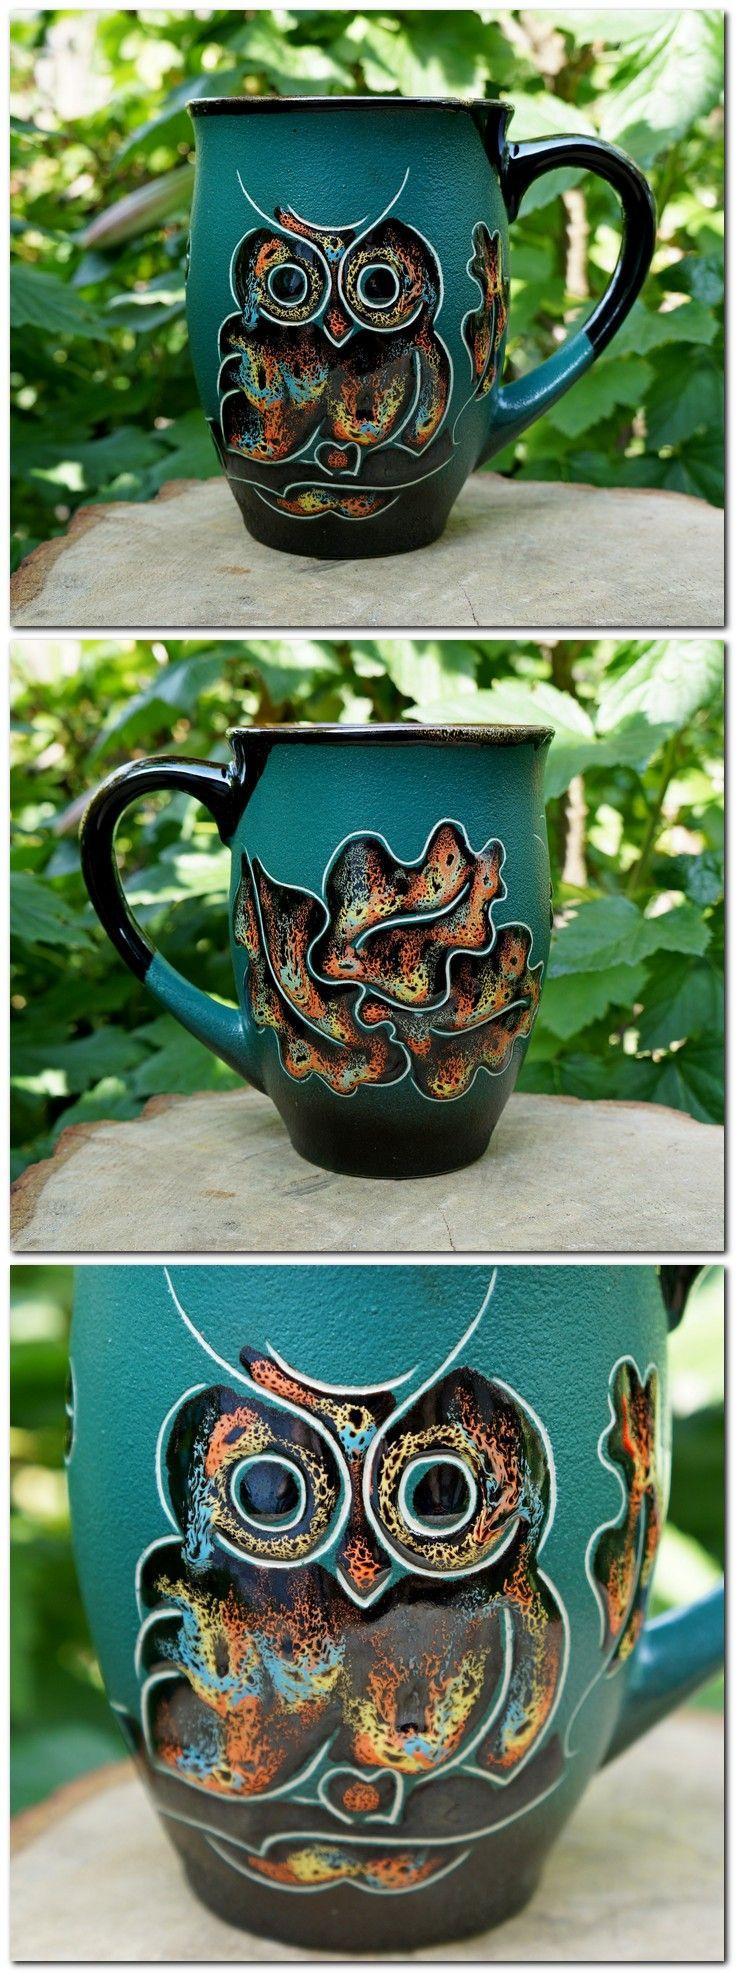 $21.85 Large coffee mug Ceramic mug Owl Gift for father Coffee cup Brother gift Mom gift Husband gift Daughter gift Green Owls mug Office gift #Owl_mug_ceramic #large_coffee_mug #wife_mug